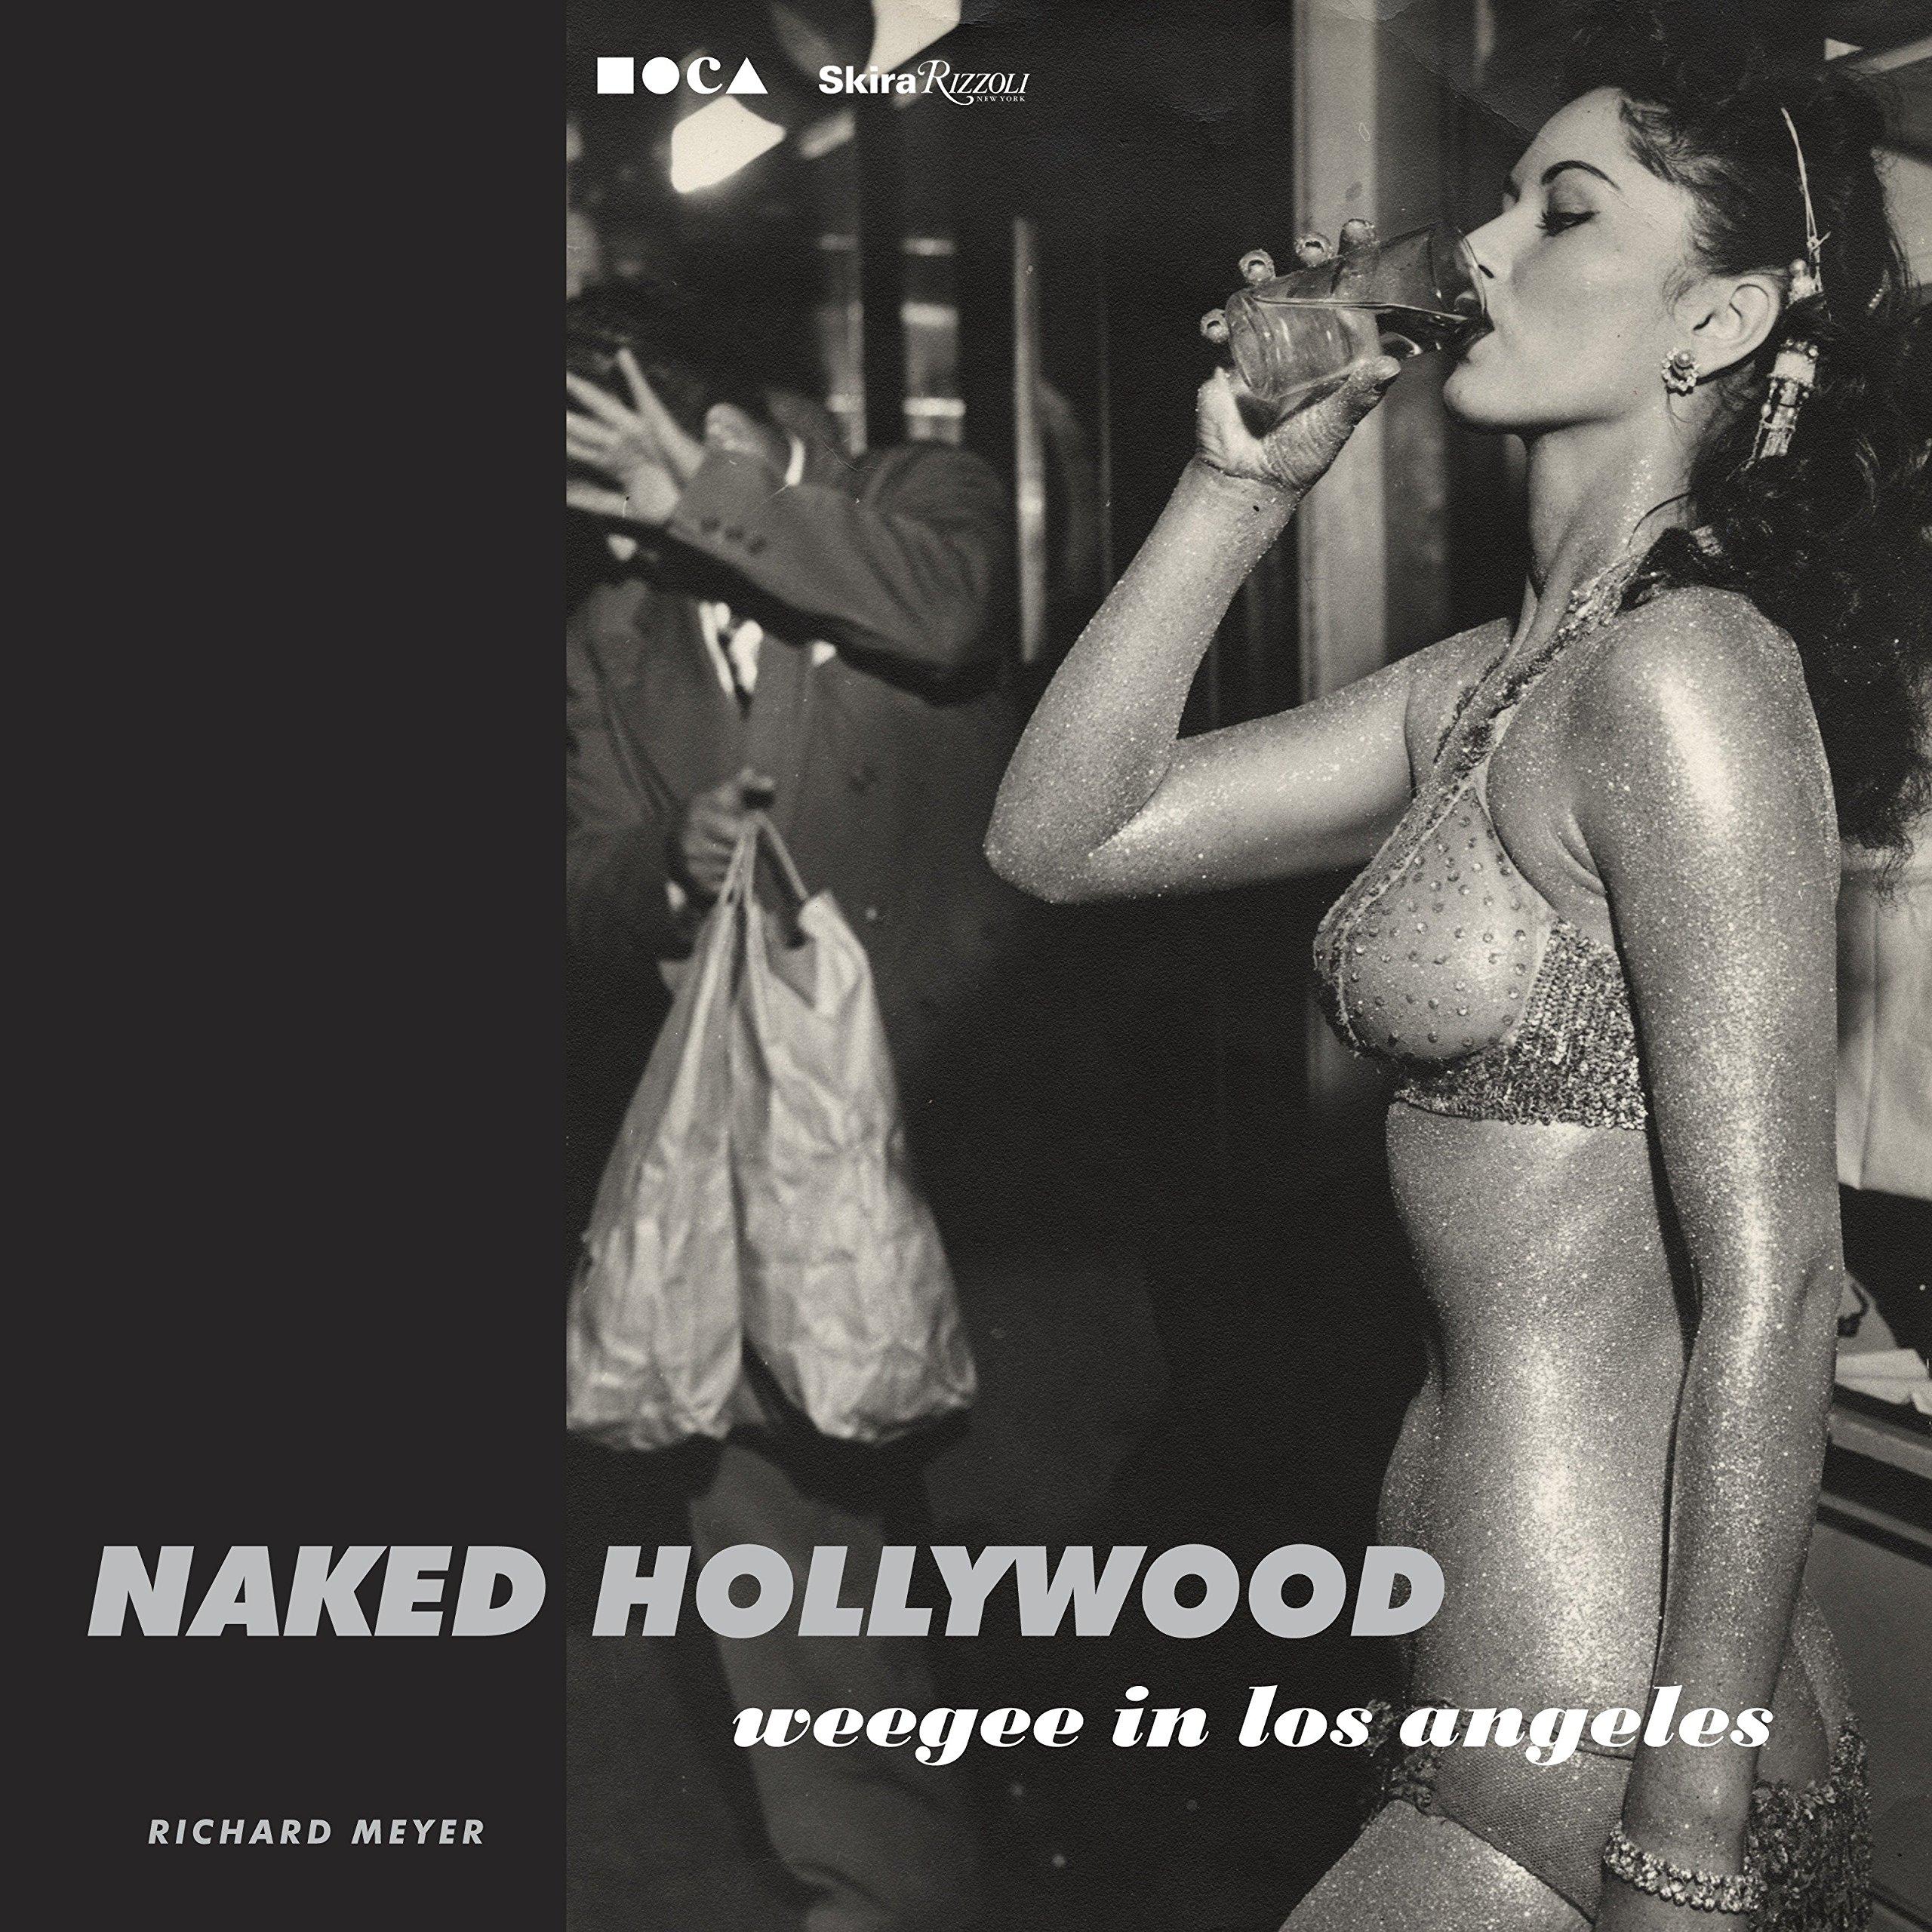 Naked Hollywood: Weegee in Los Angeles